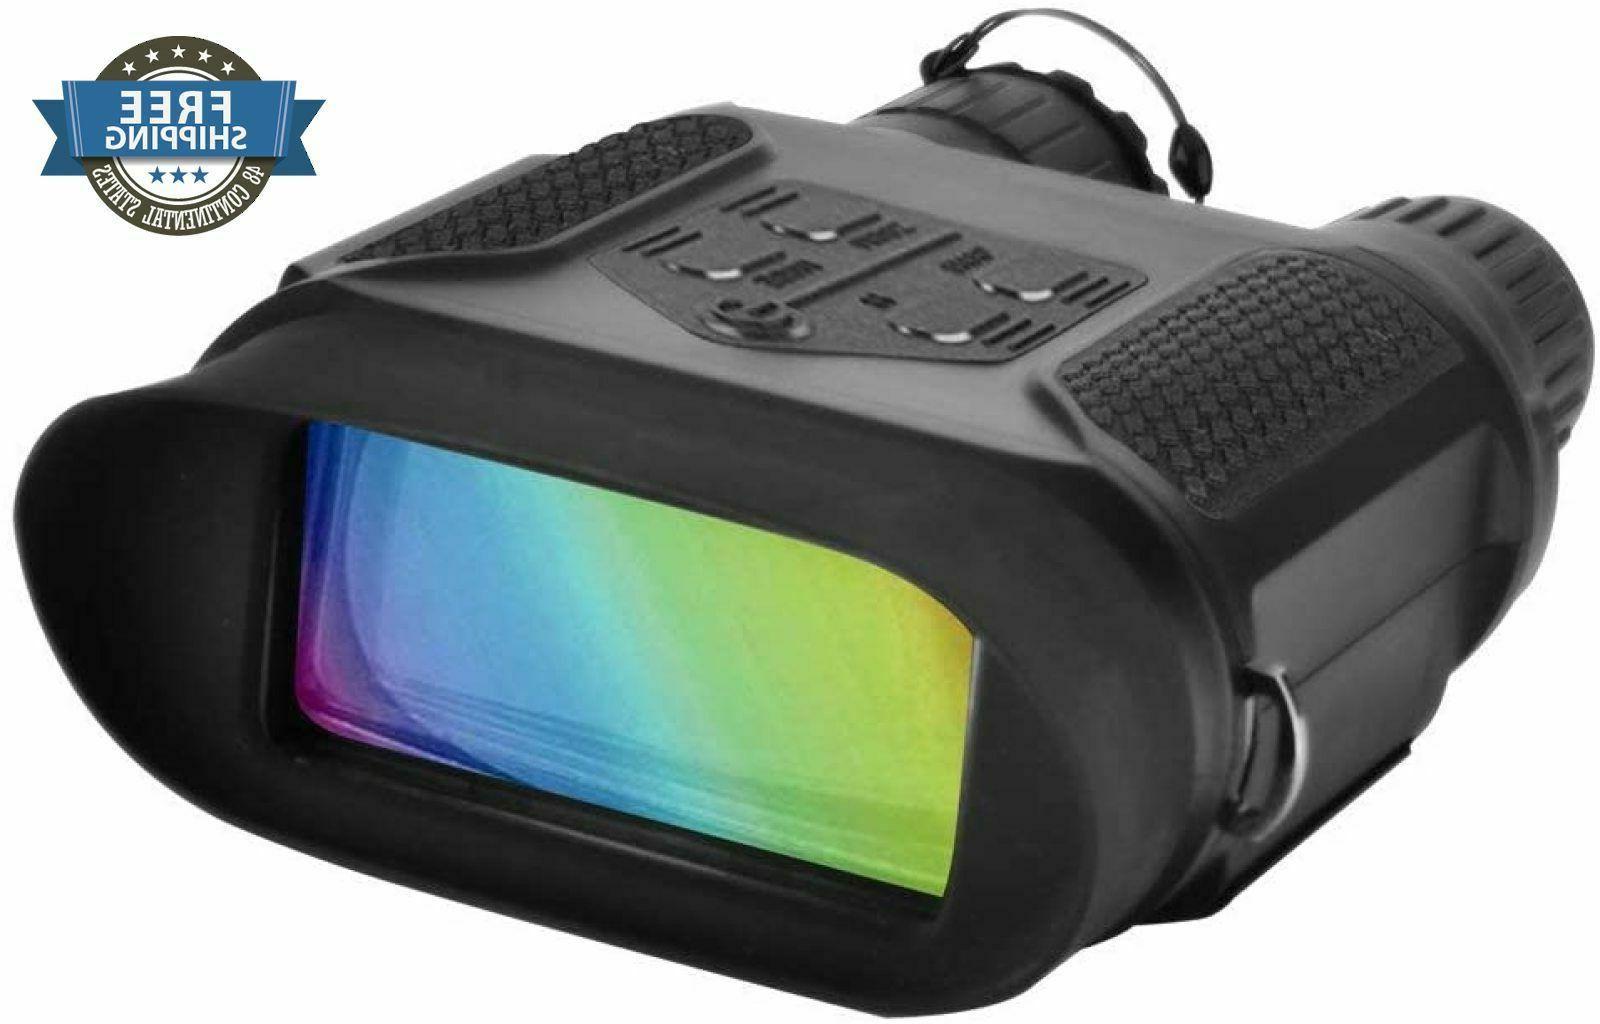 Digital 3W Infrared Night Vision Binocular Hunt Large Viewin